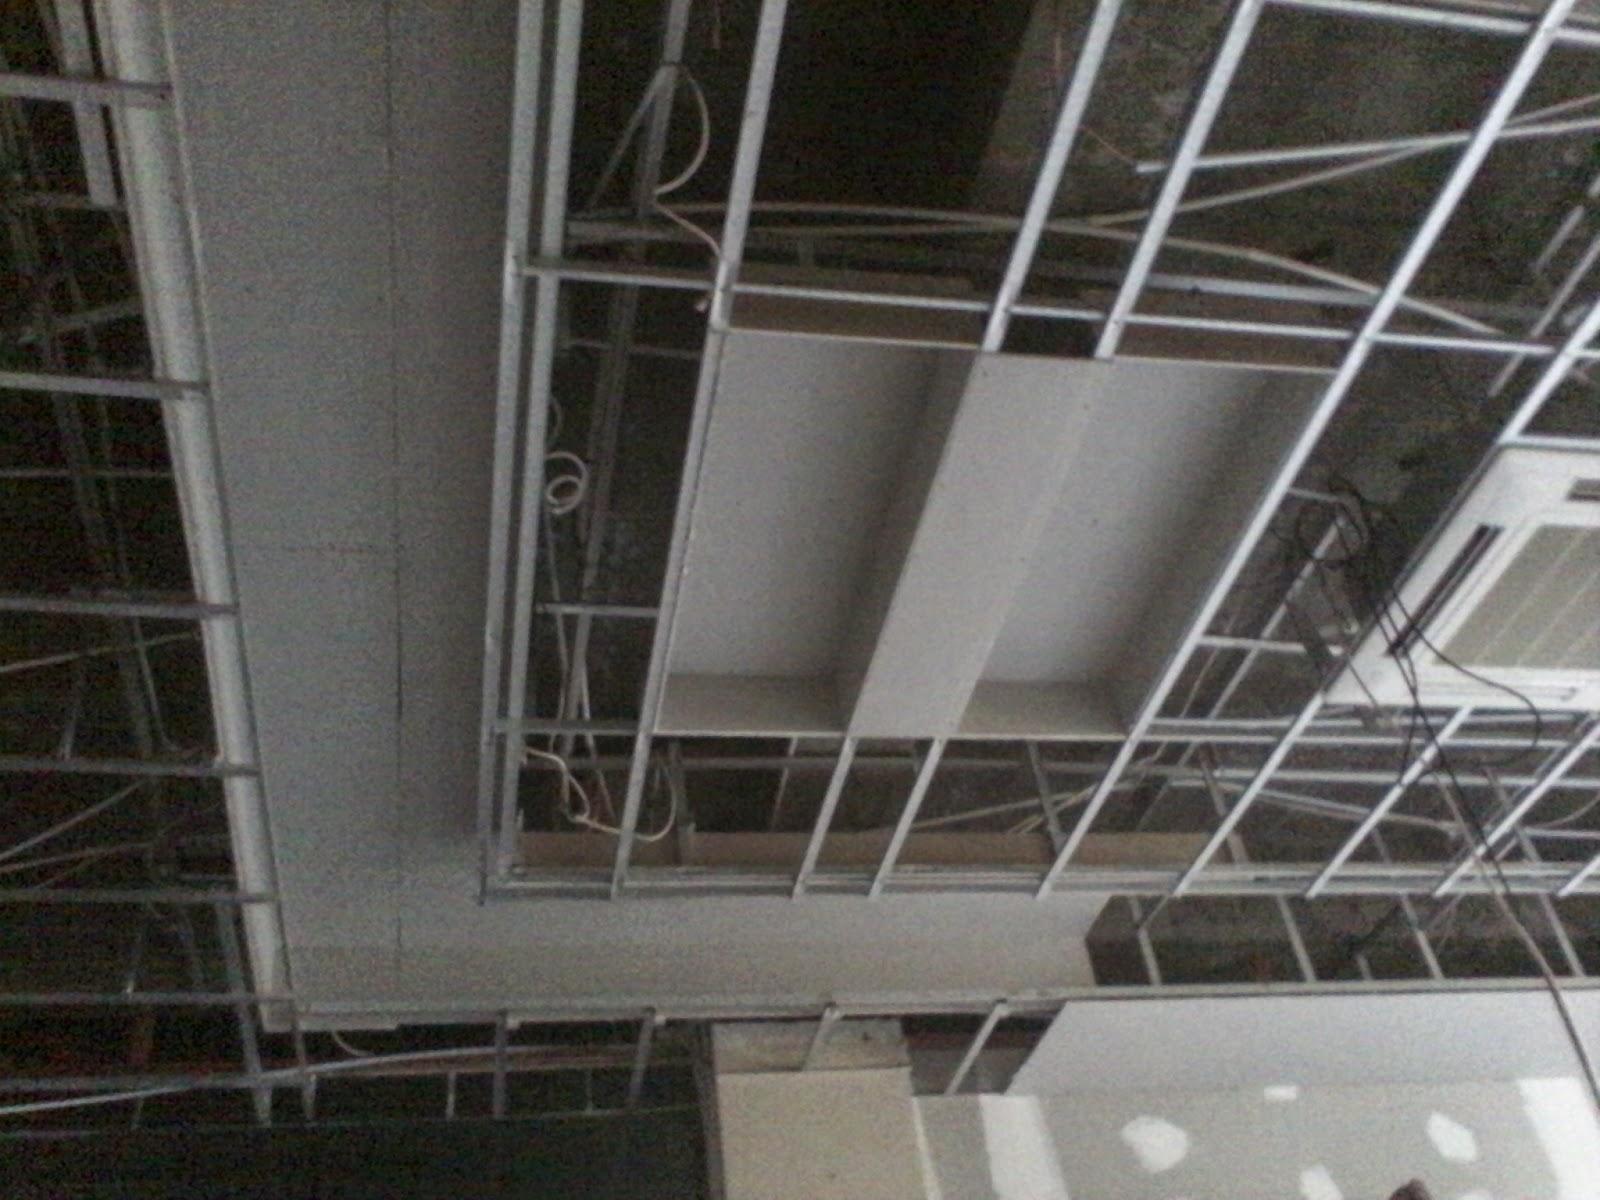 Rangka Plafond Drop Ceiling www Gradschoolfairs com